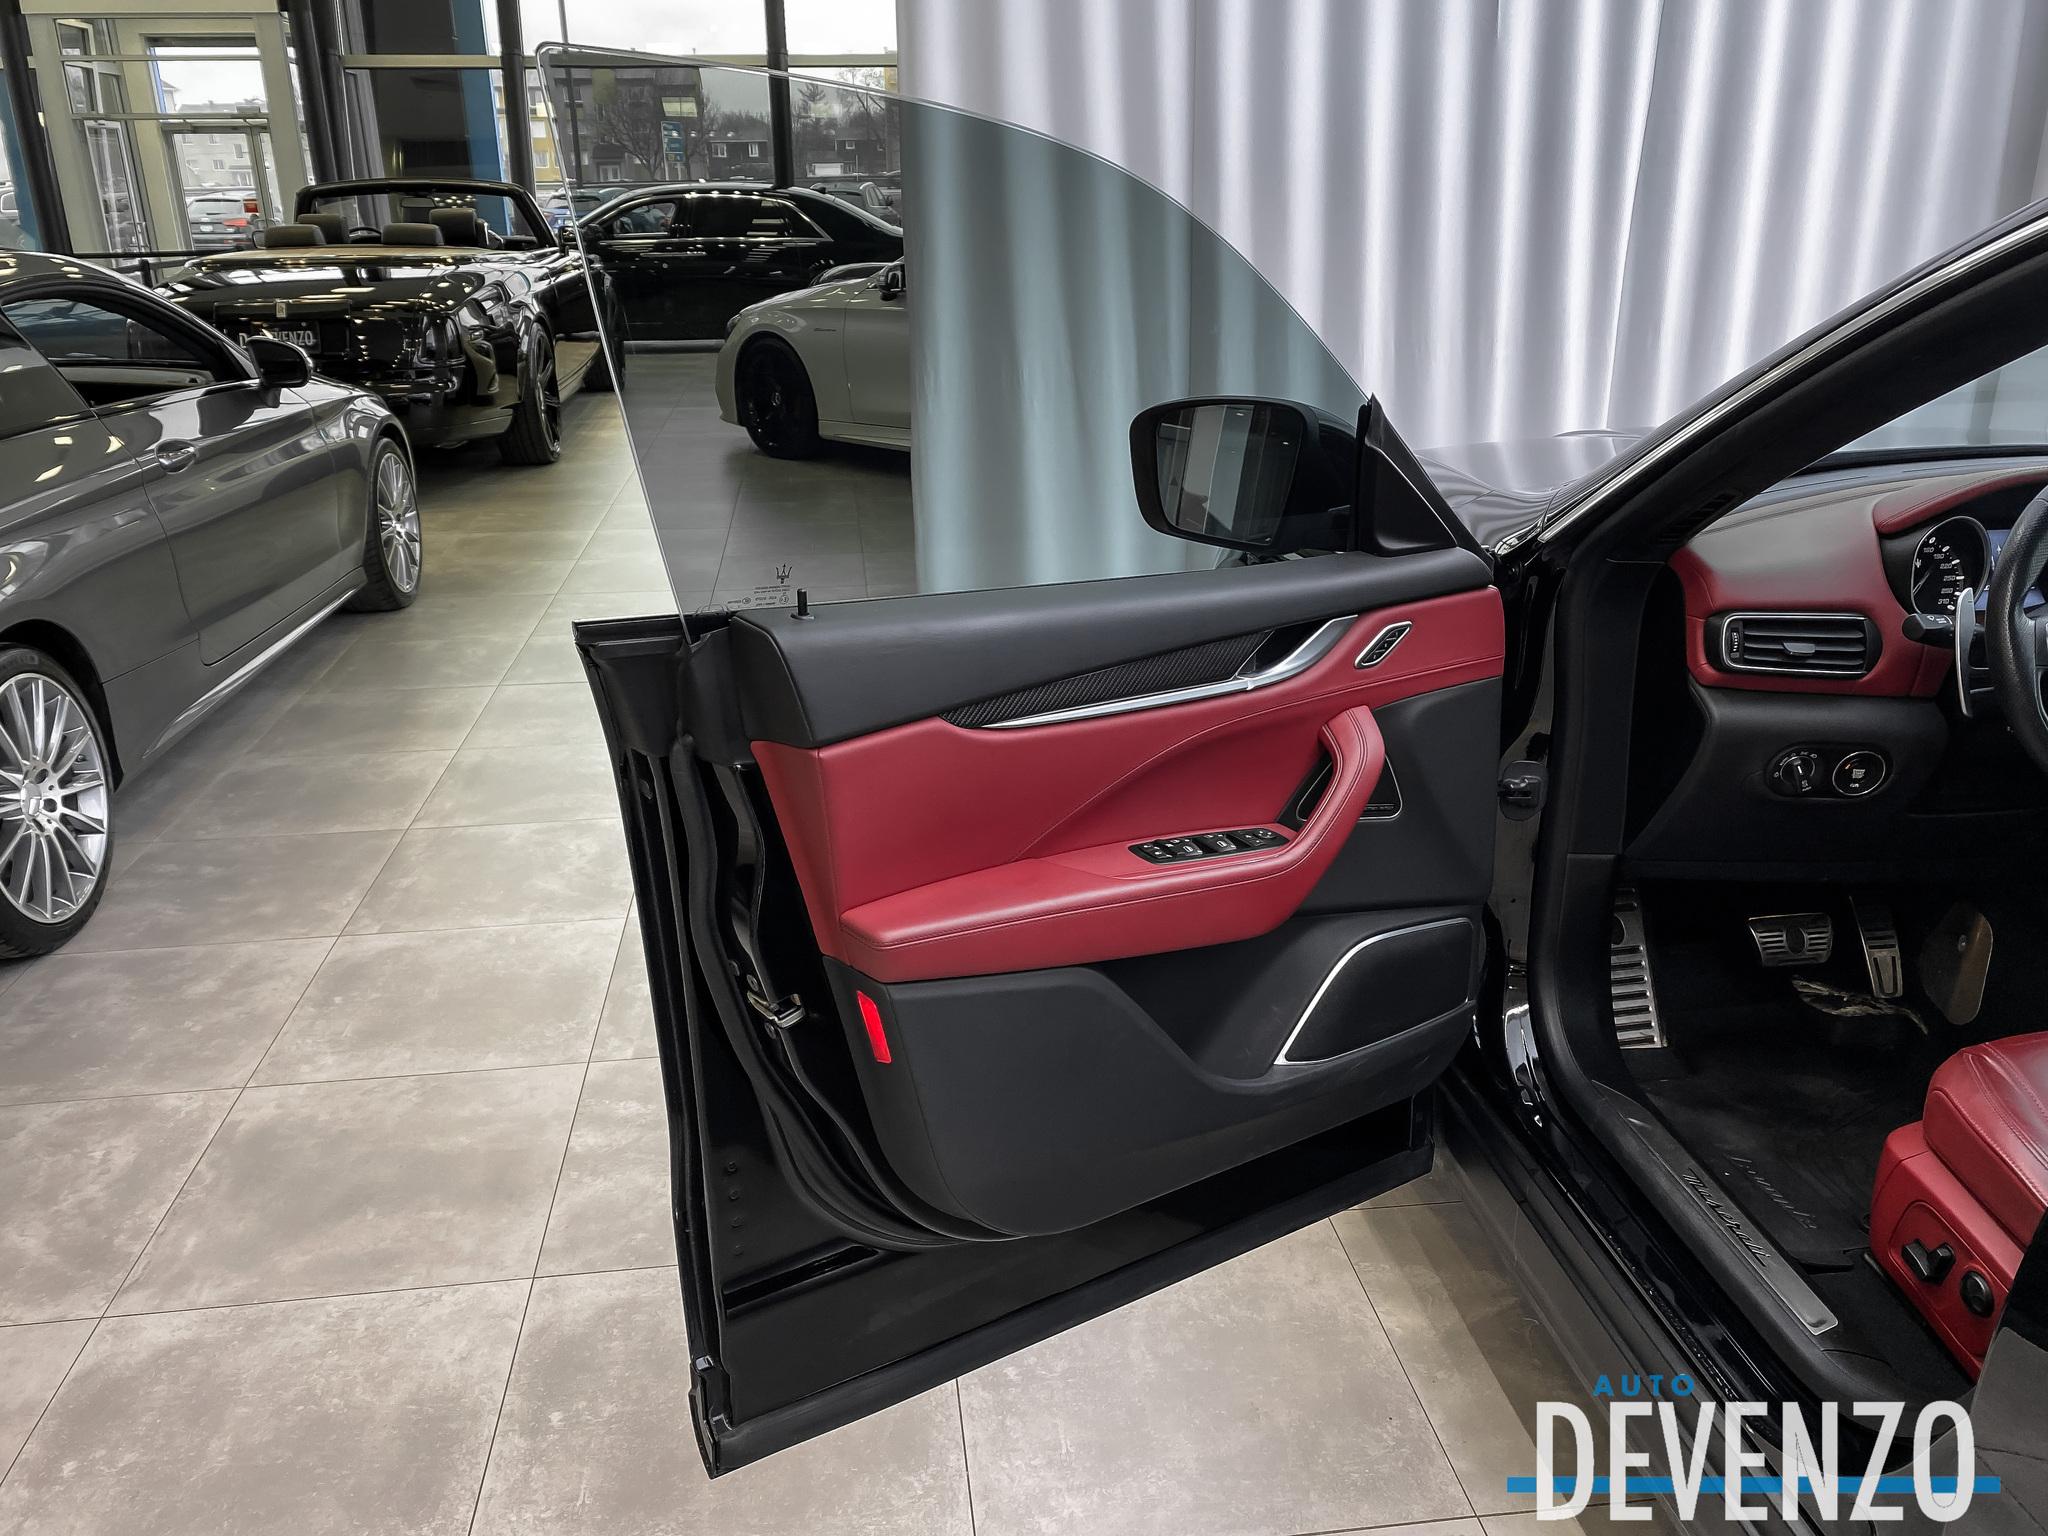 2018 Maserati Levante S GranSport 3.0L AWD 430HP Carbon Fiber / 21»' complet